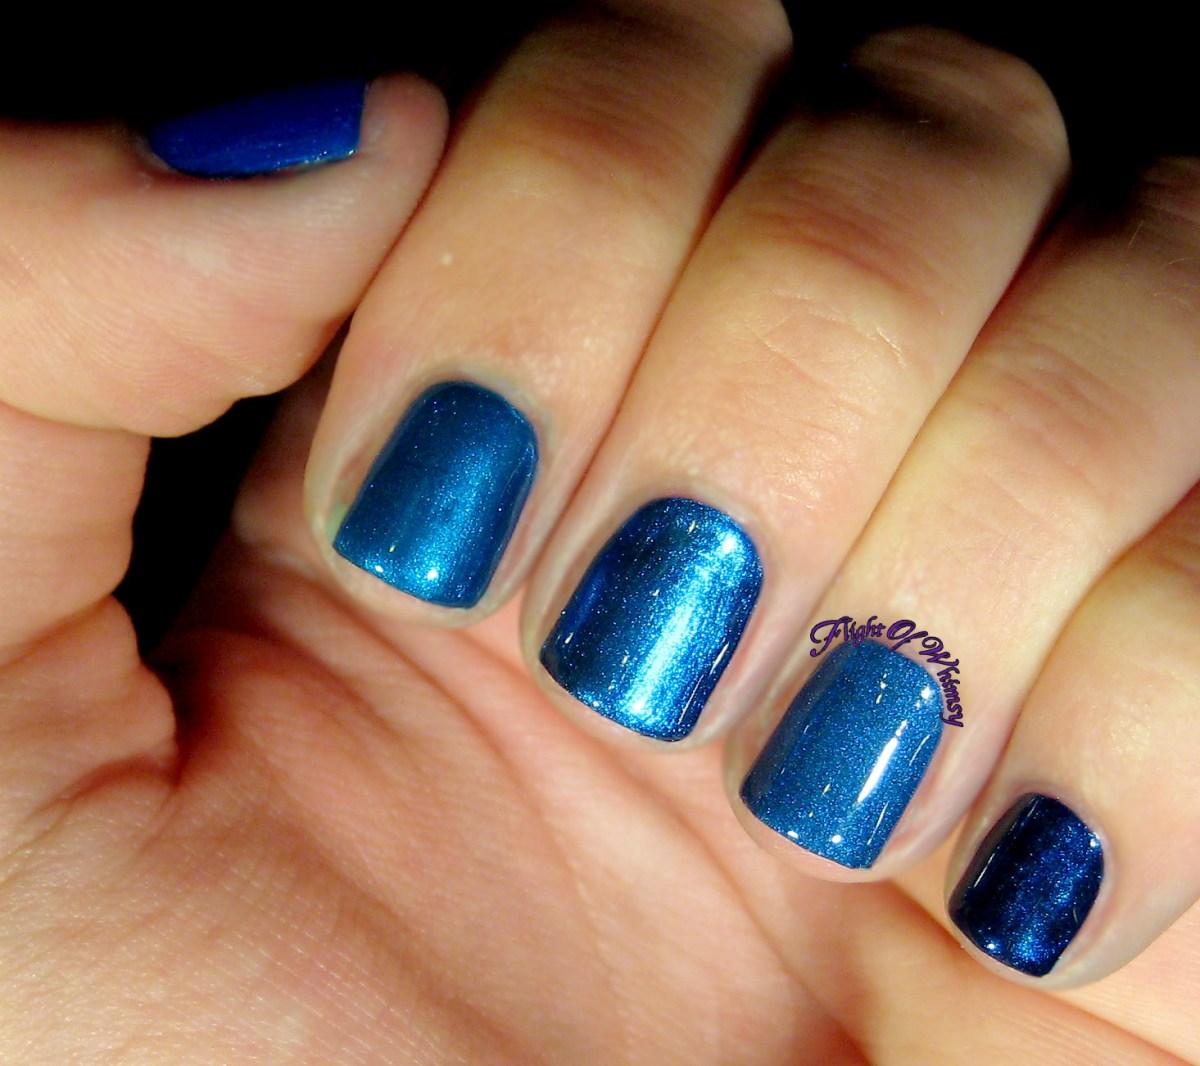 tiny nails metallic blue mish-mash